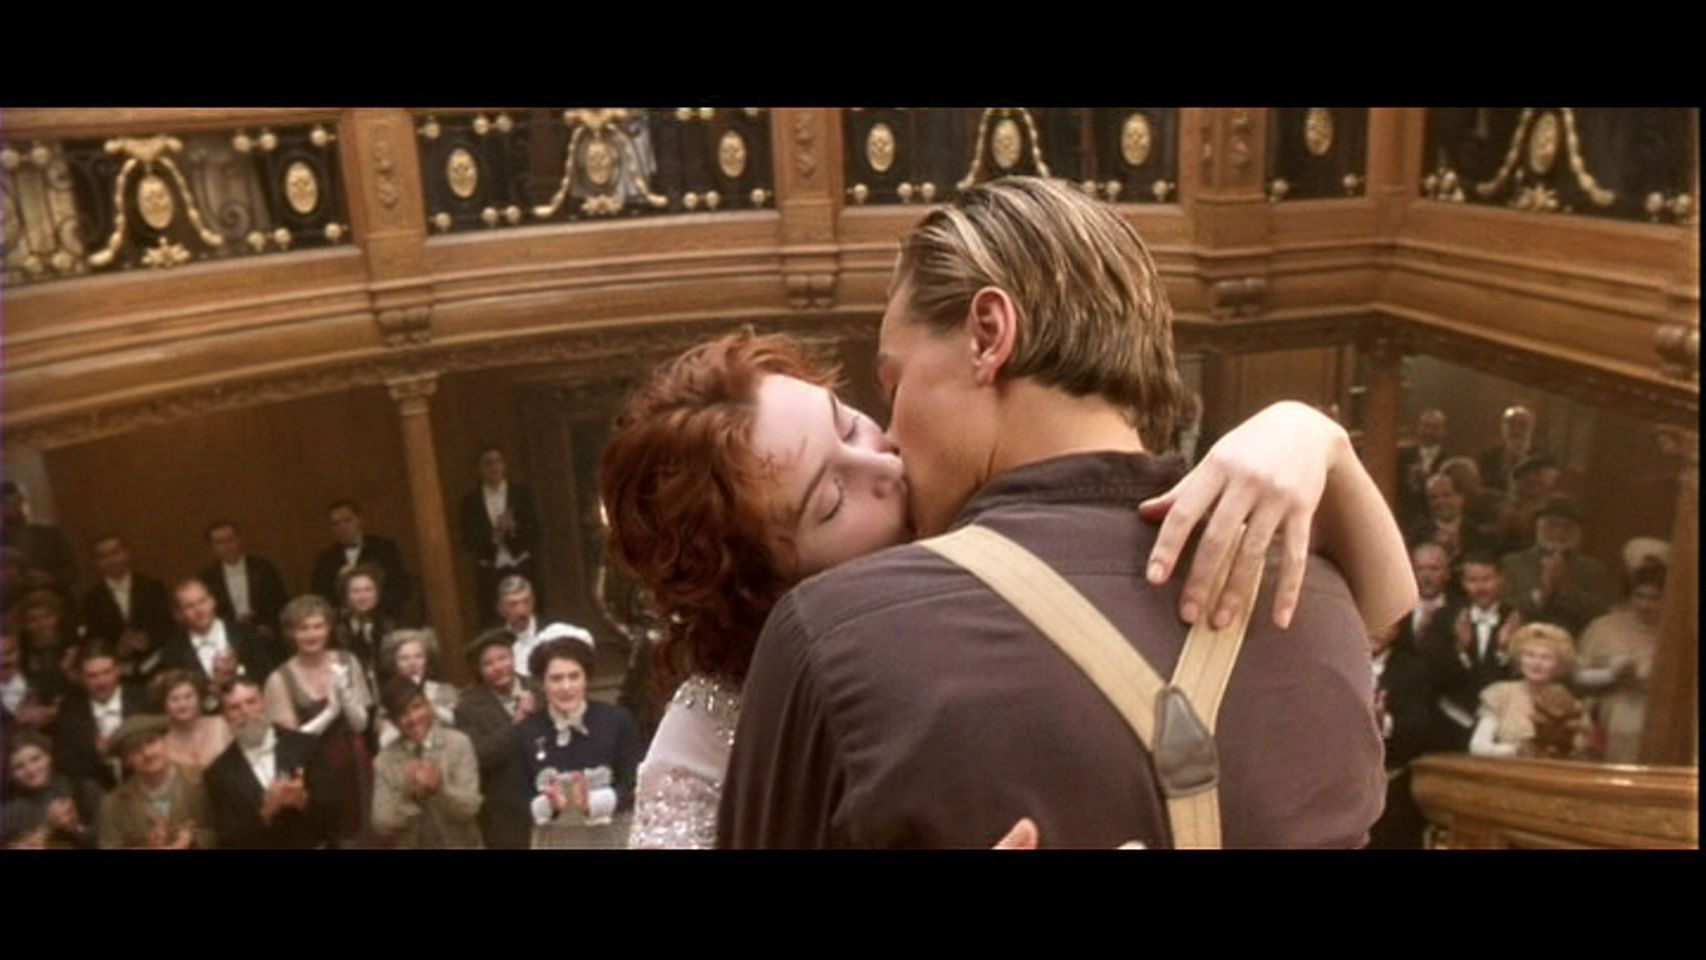 romantic love | titanic: a romantic love story - love image